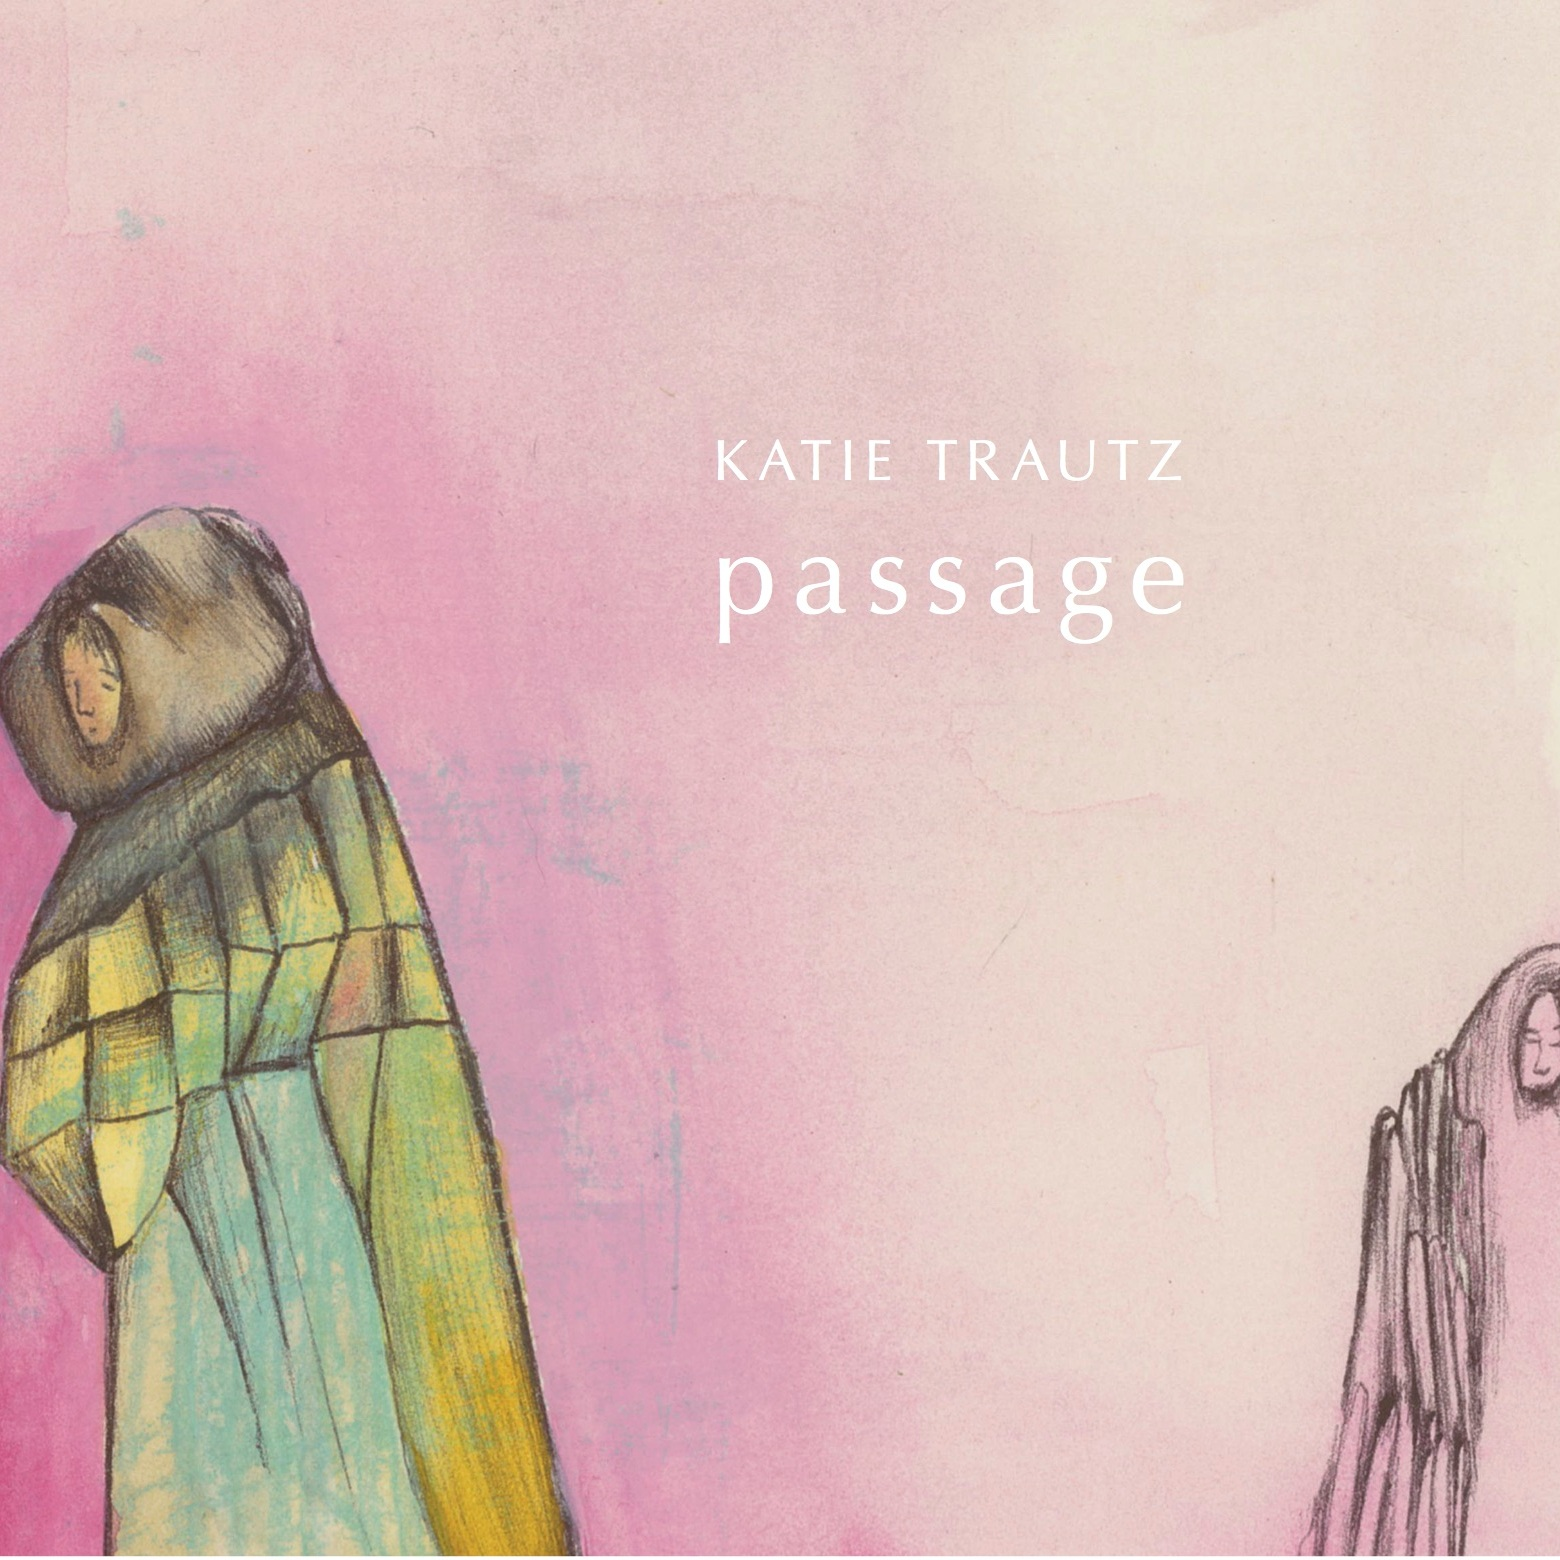 KatieTrautz-Passage_Cover.jpg